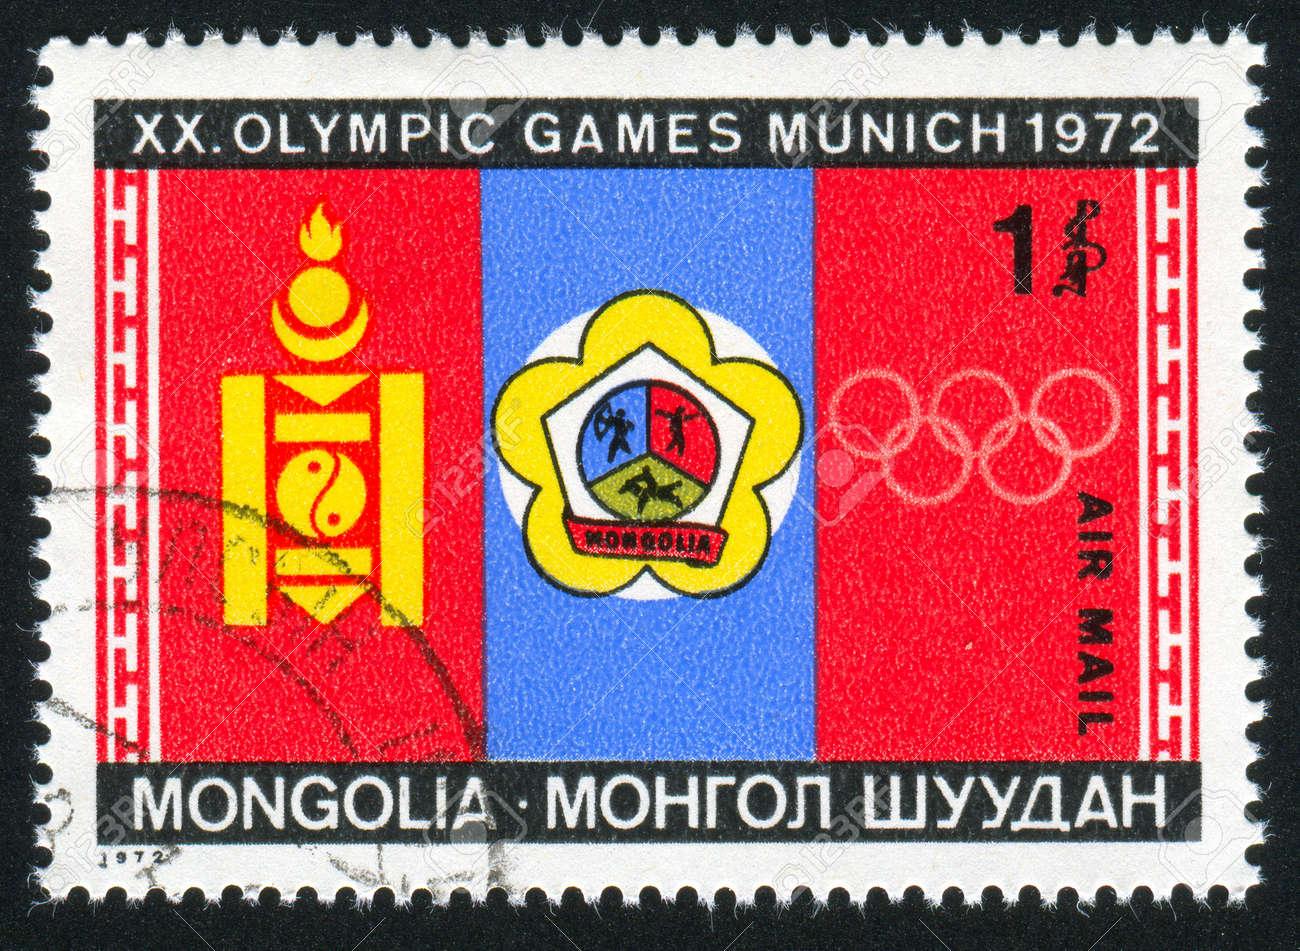 MONGOLIA - CIRCA 1972: stamp printed by Mongolia, shows Olympic games, circa 1972 Stock Photo - 12788219